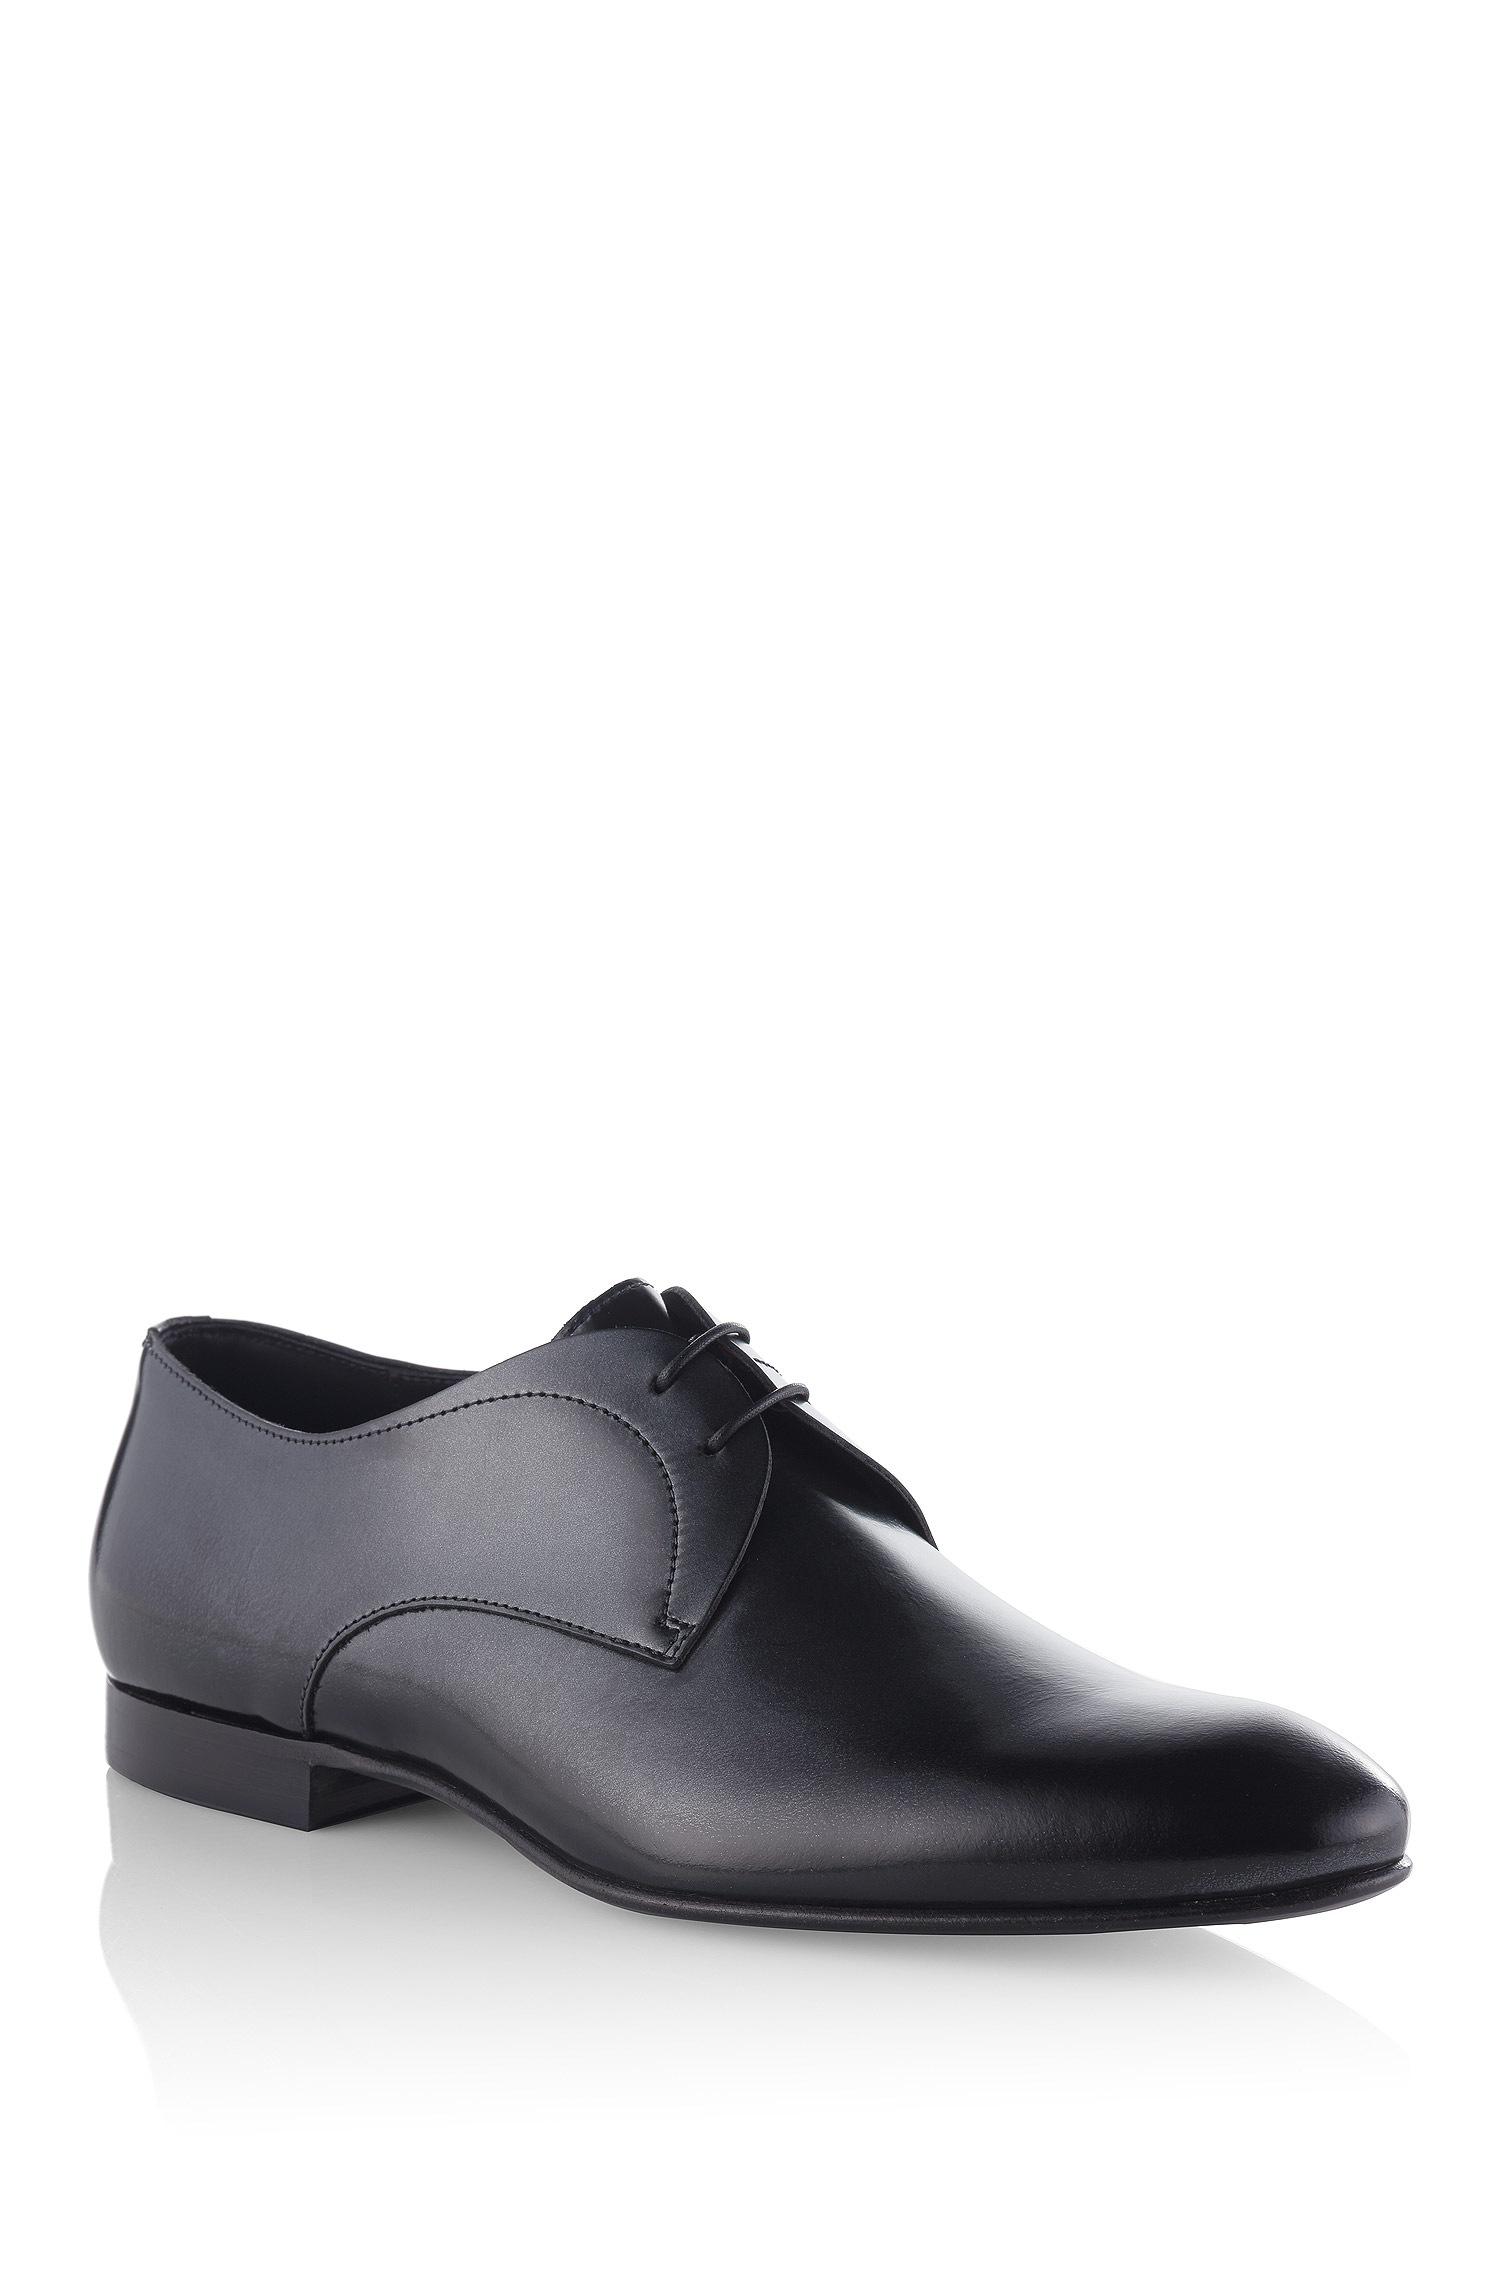 Normal Toe Box Dress Shoes